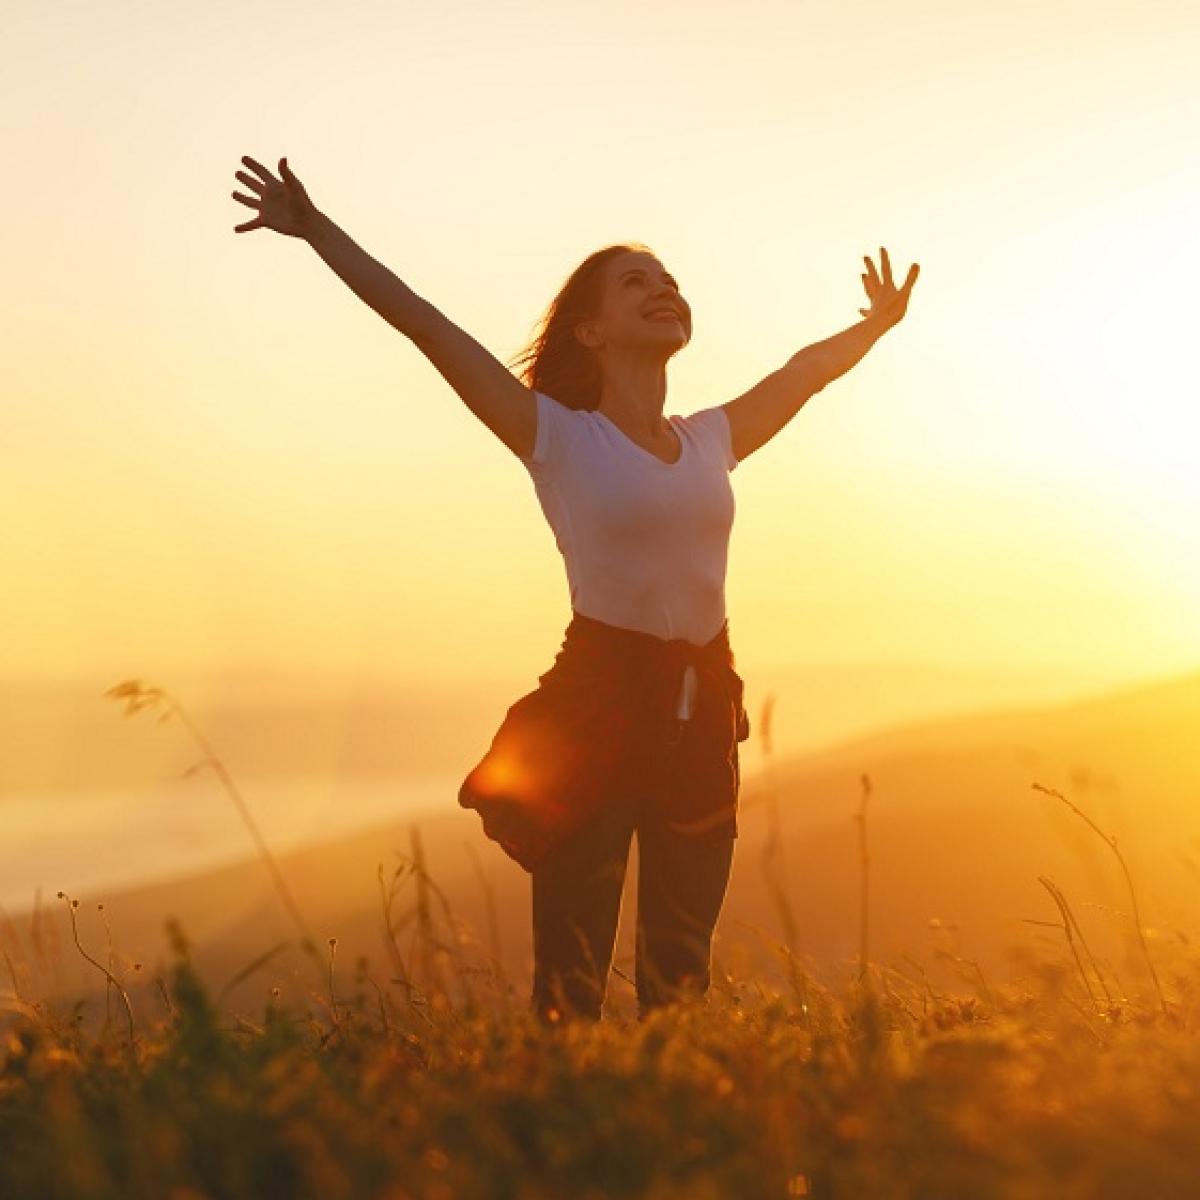 Guiding Light by Dada J. P. Vaswani: Life is rocking!